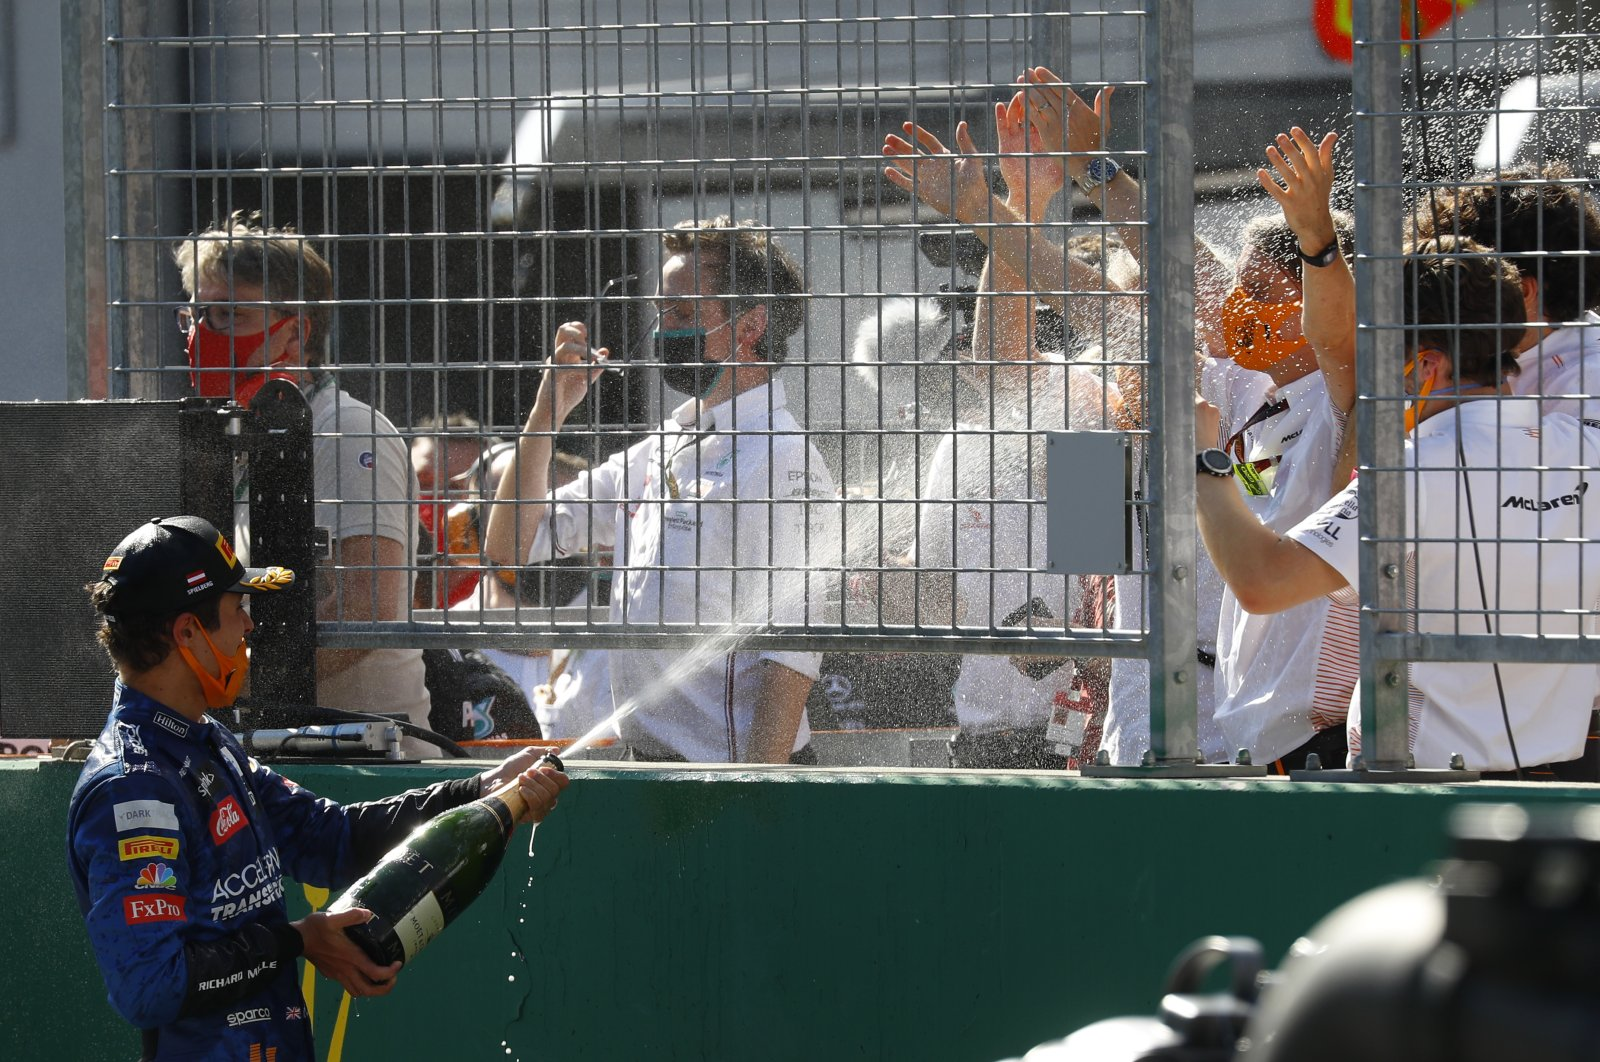 McLarens' Lando Norris sprays champagne after the Austrian Grand Prix in Spielberg, Austria, July 5, 2020. (AP Photo)